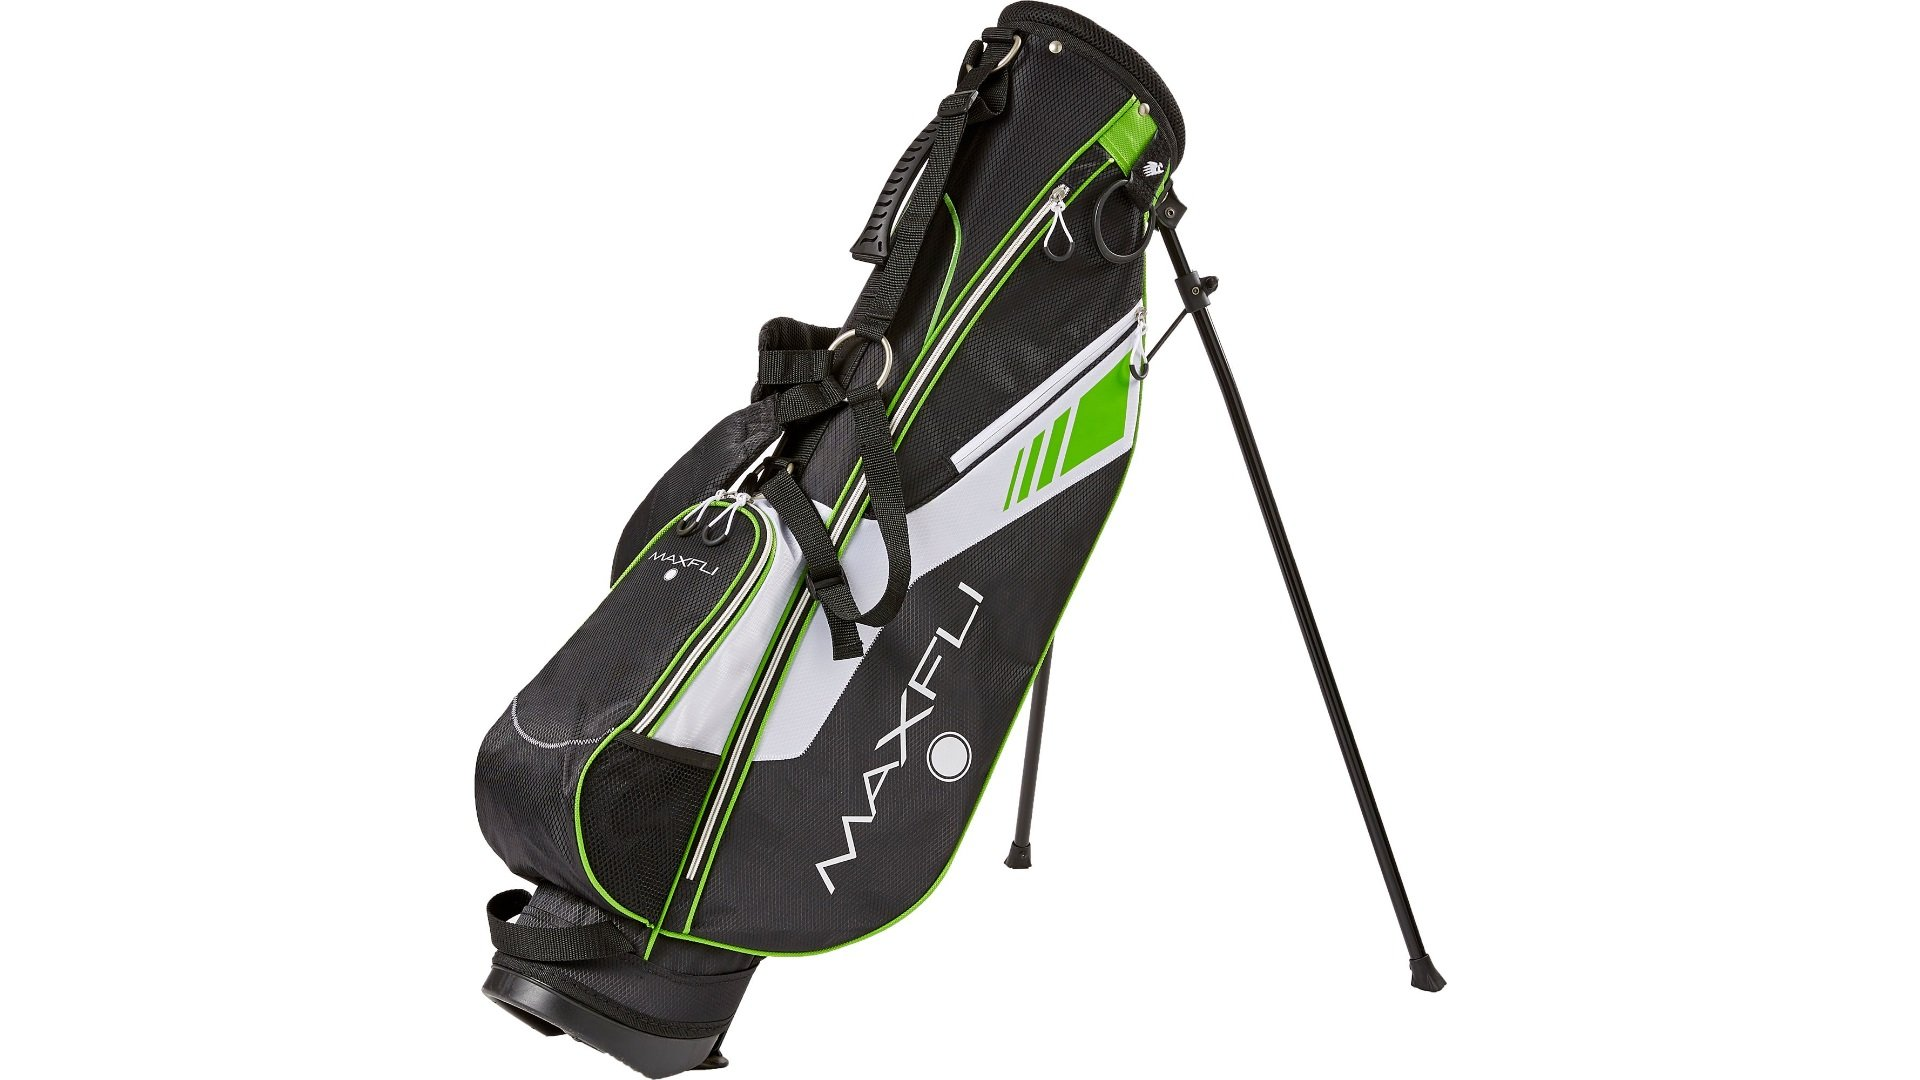 Maxfli Golf Sunday Stand Bag - Black/Green